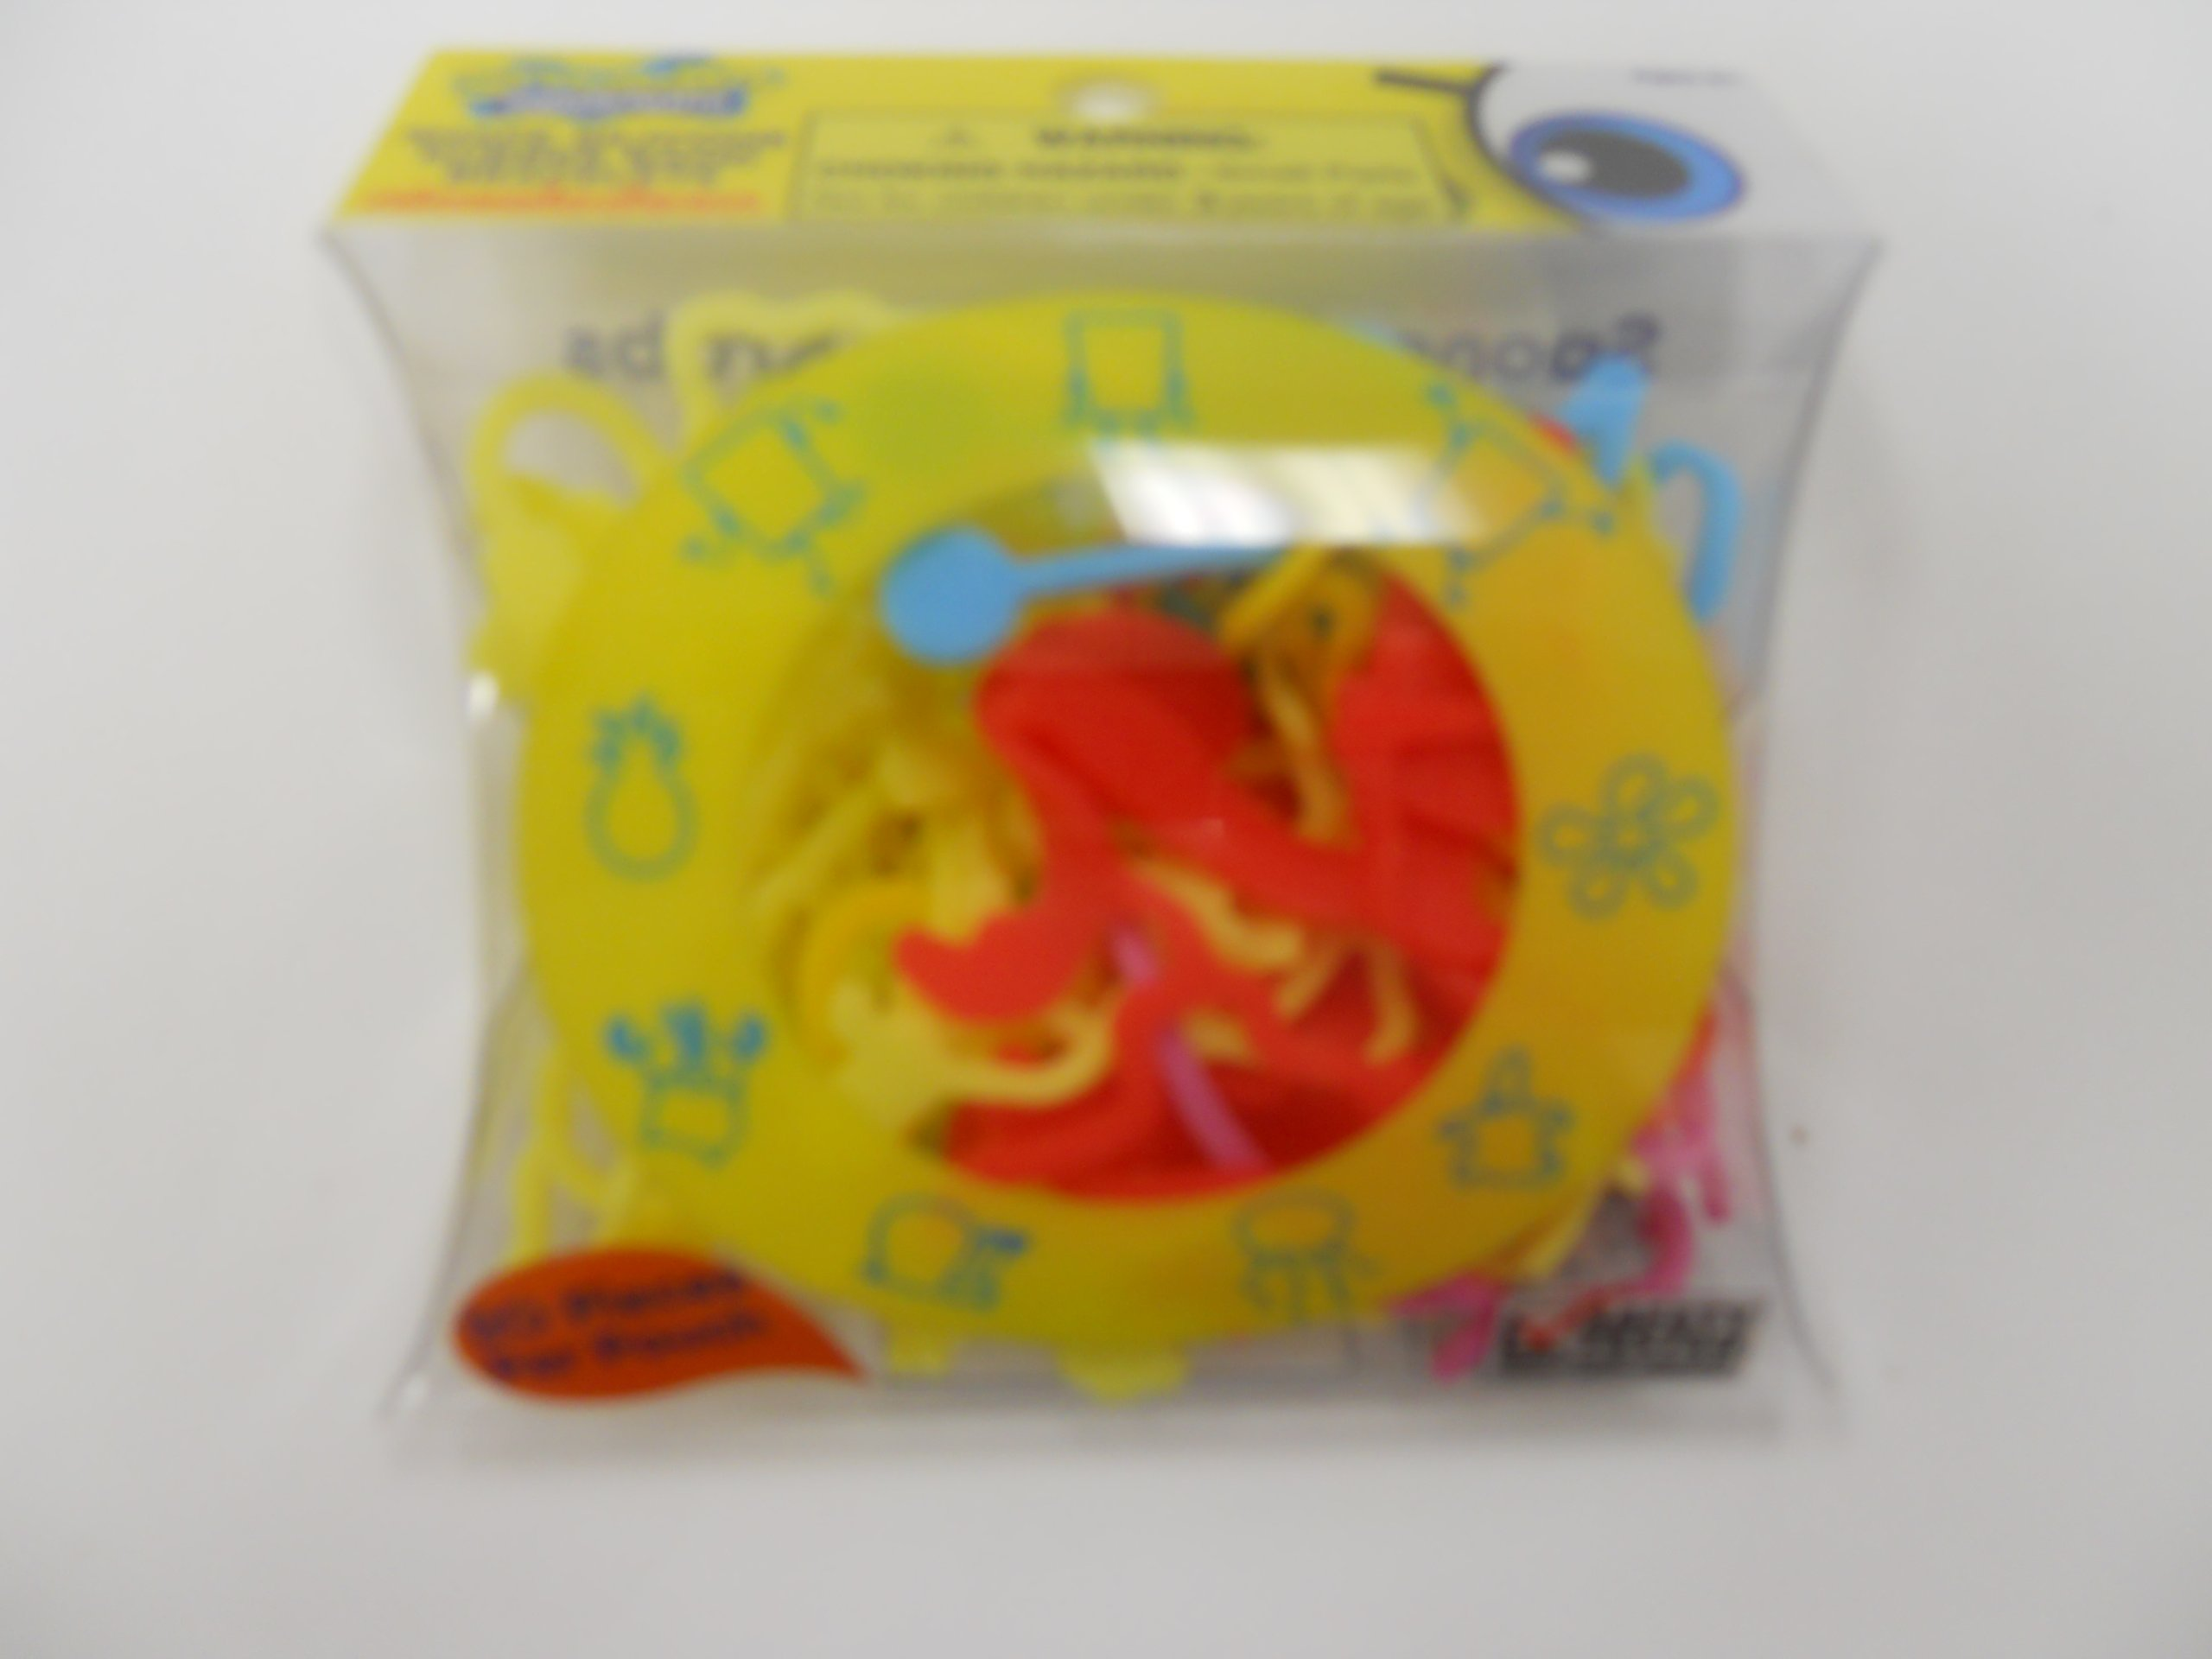 Spongebob Nickelodeon Shape Silicone Rubber Bands Bandz Bracelets 20c